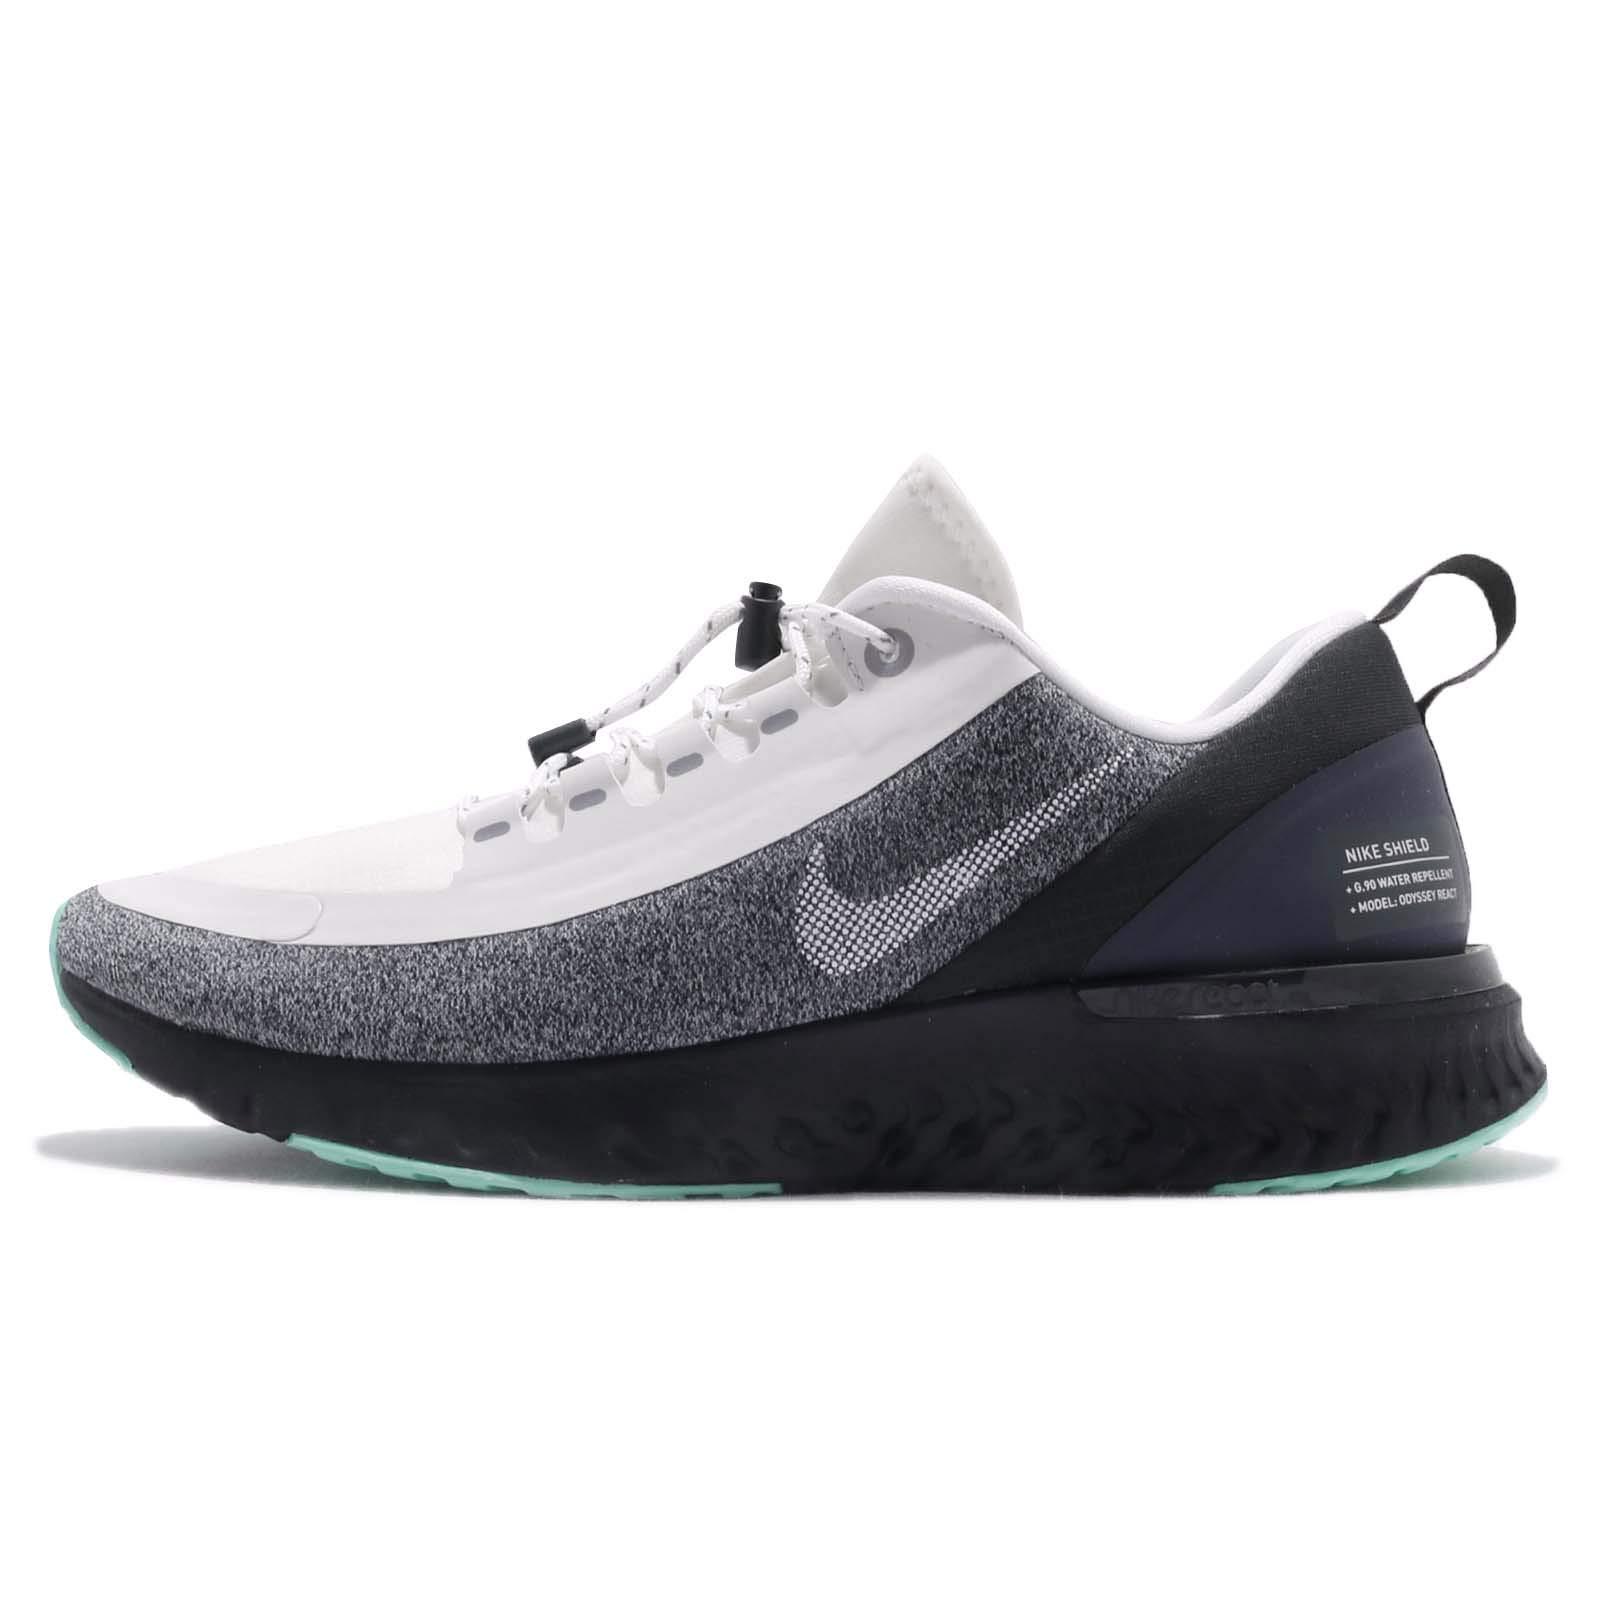 newest 2f0f1 931d5 Nike Women Odyssey React Shield Running Shoe White/Black/Green (US 7)